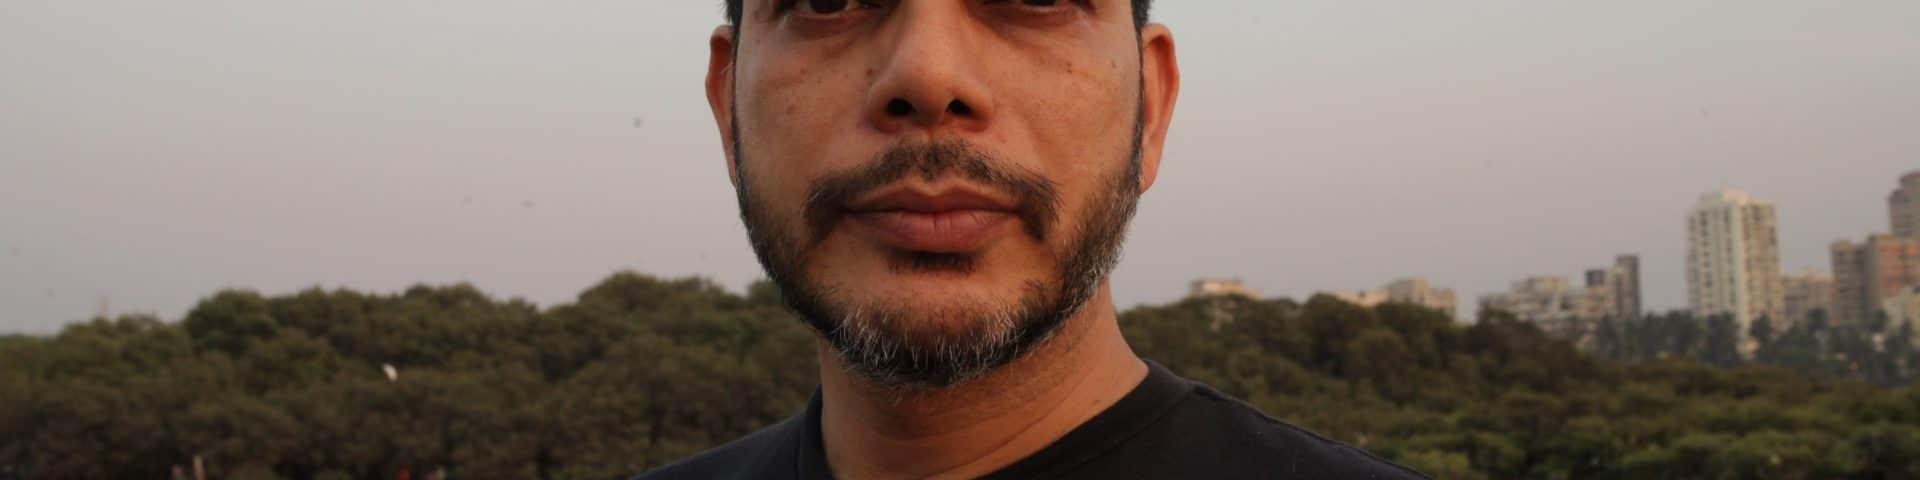 Ankur-Vikal